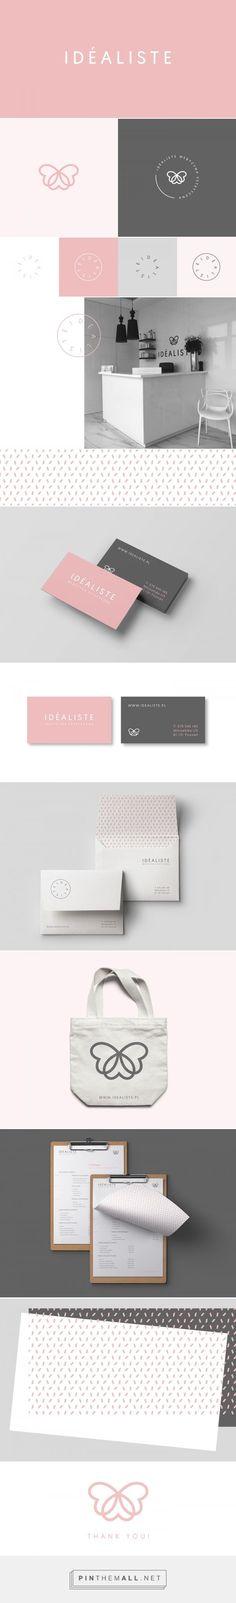 Idéaliste Aesthetic Medicine Branding by Rita Duczmańska | Fivestar Branding Agency – Design and Branding Agency & Curated Inspiration Gallery #FivestarBrandingAgency #designinspiration #cosmeticbranding #branding